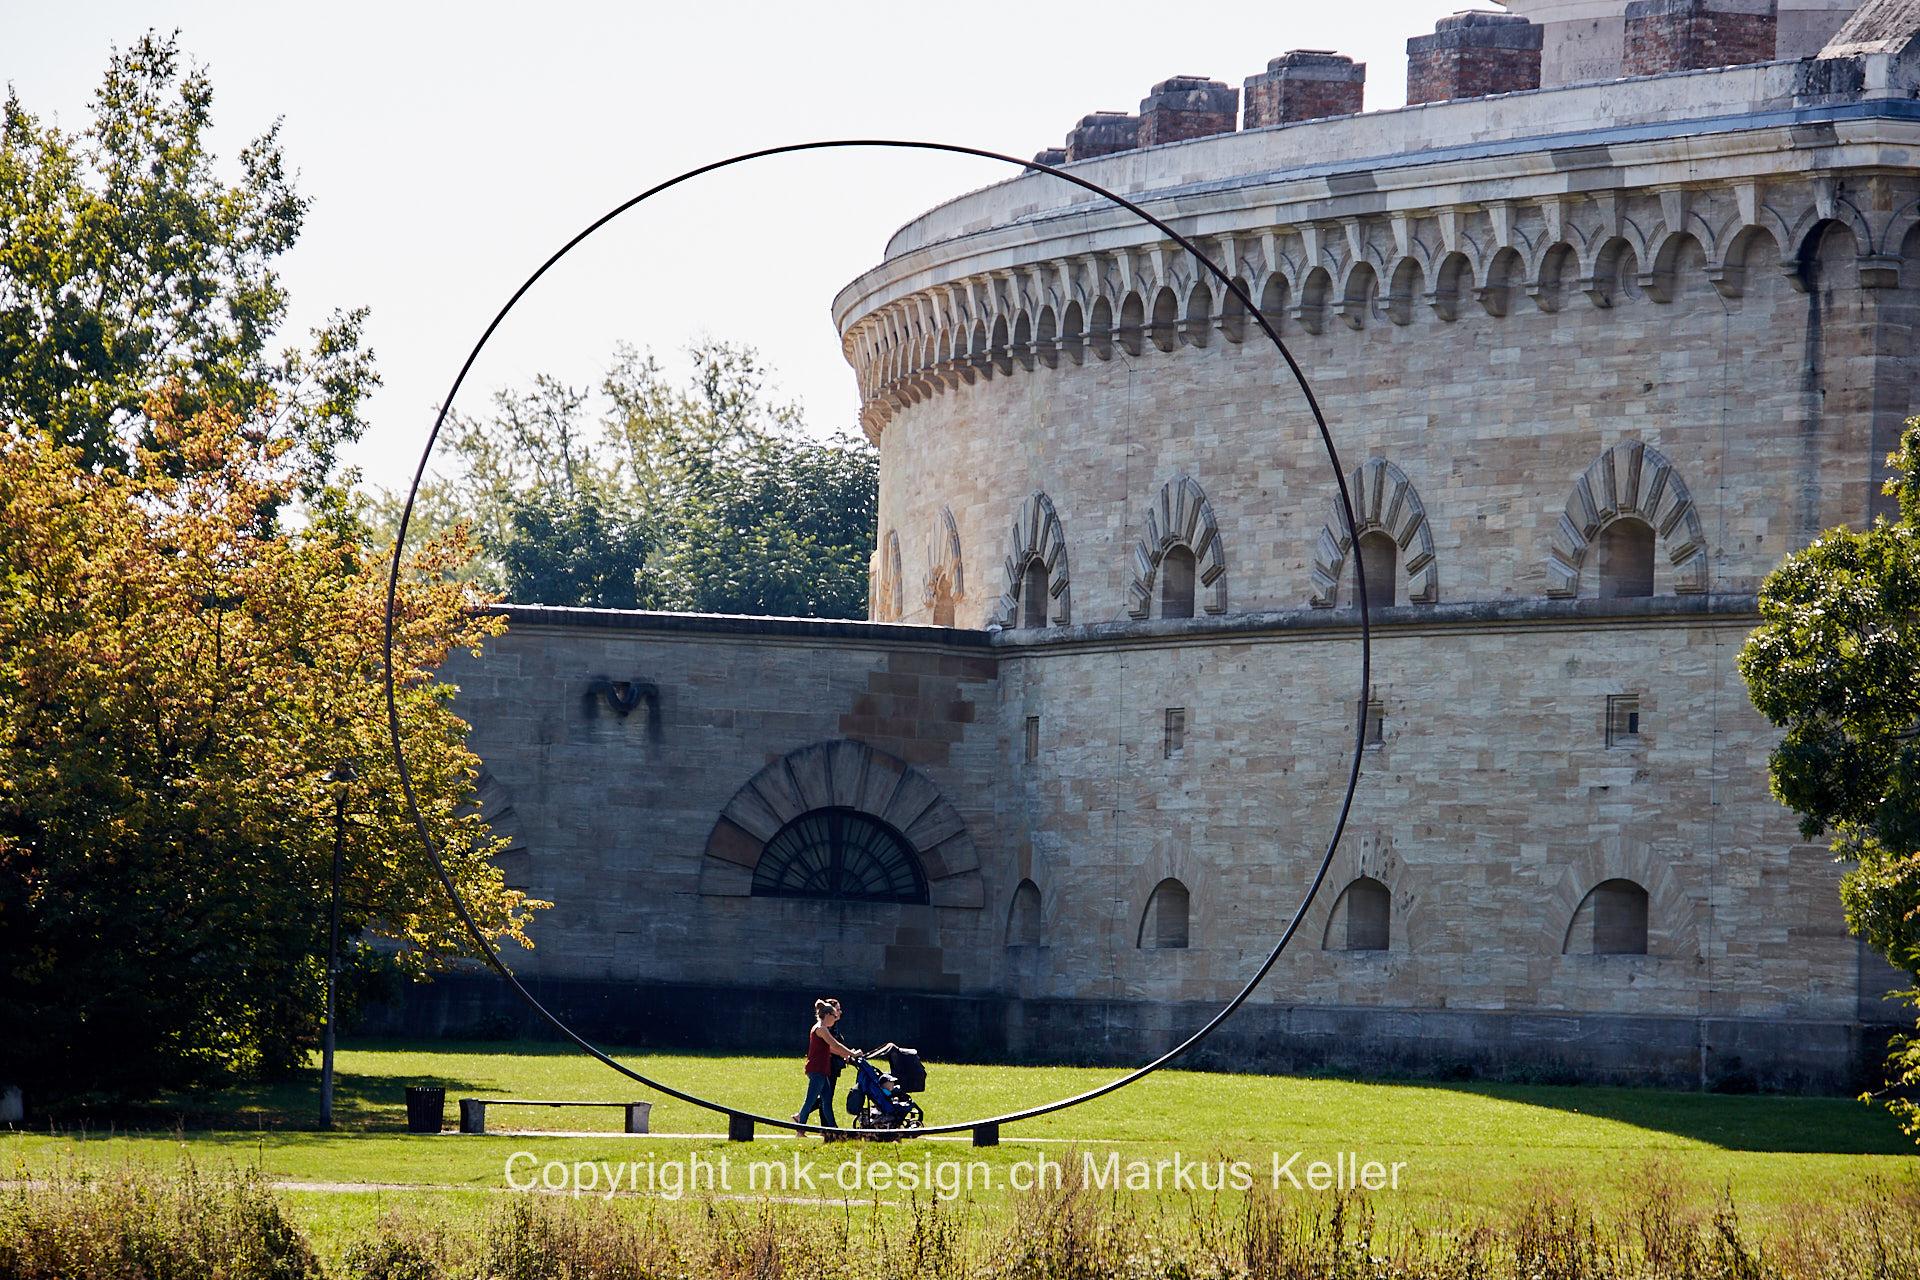 Stilleben   Mensch   Bauwerk   Statue/Skulptur